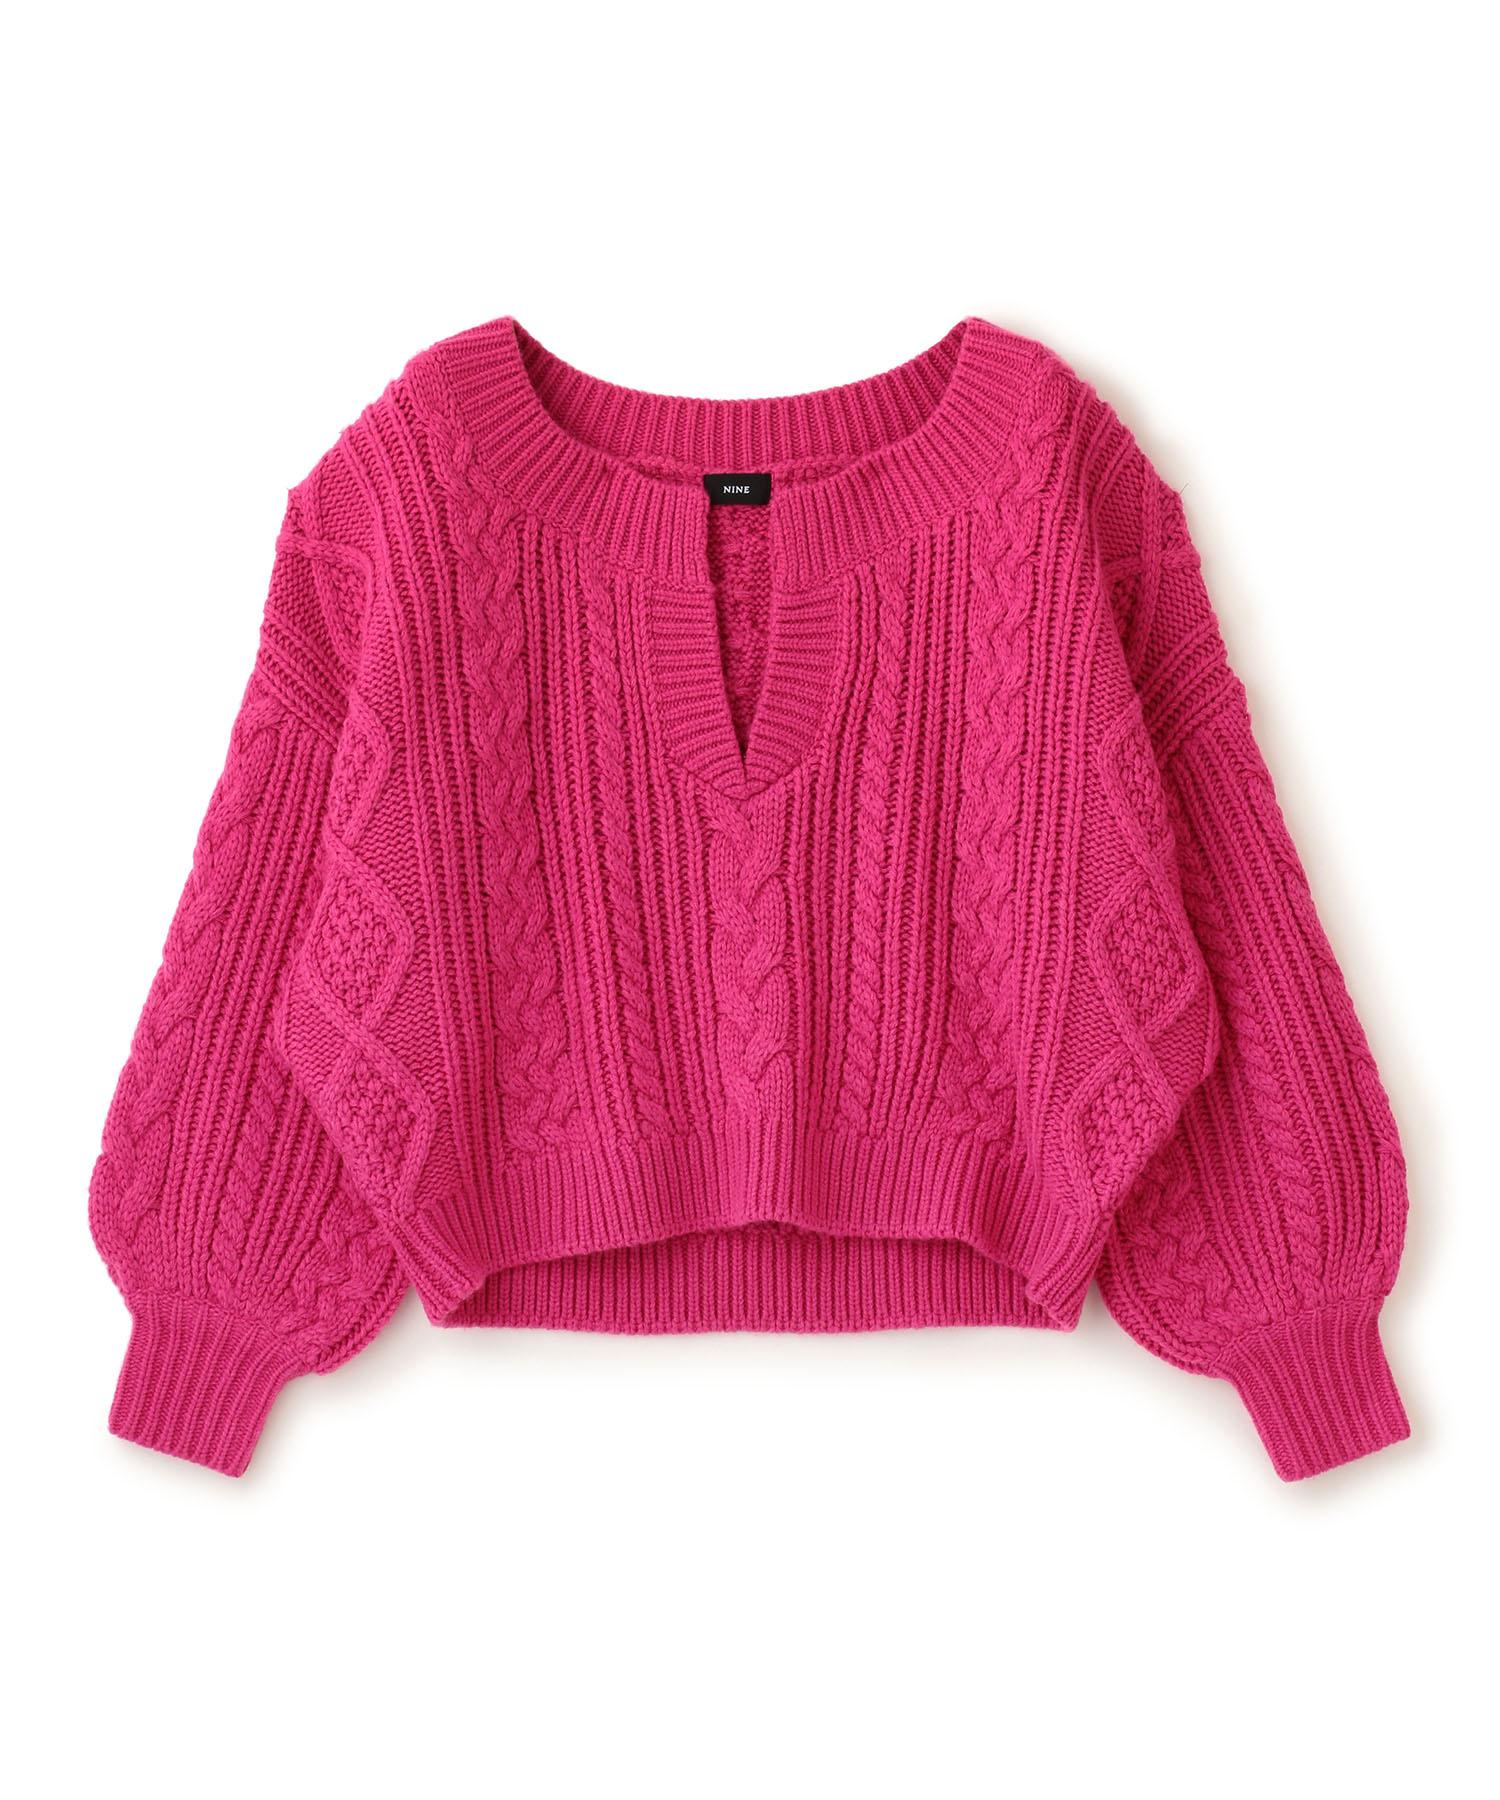 【WEB限定:ピンク】キーネックアラン編みプルオーバー